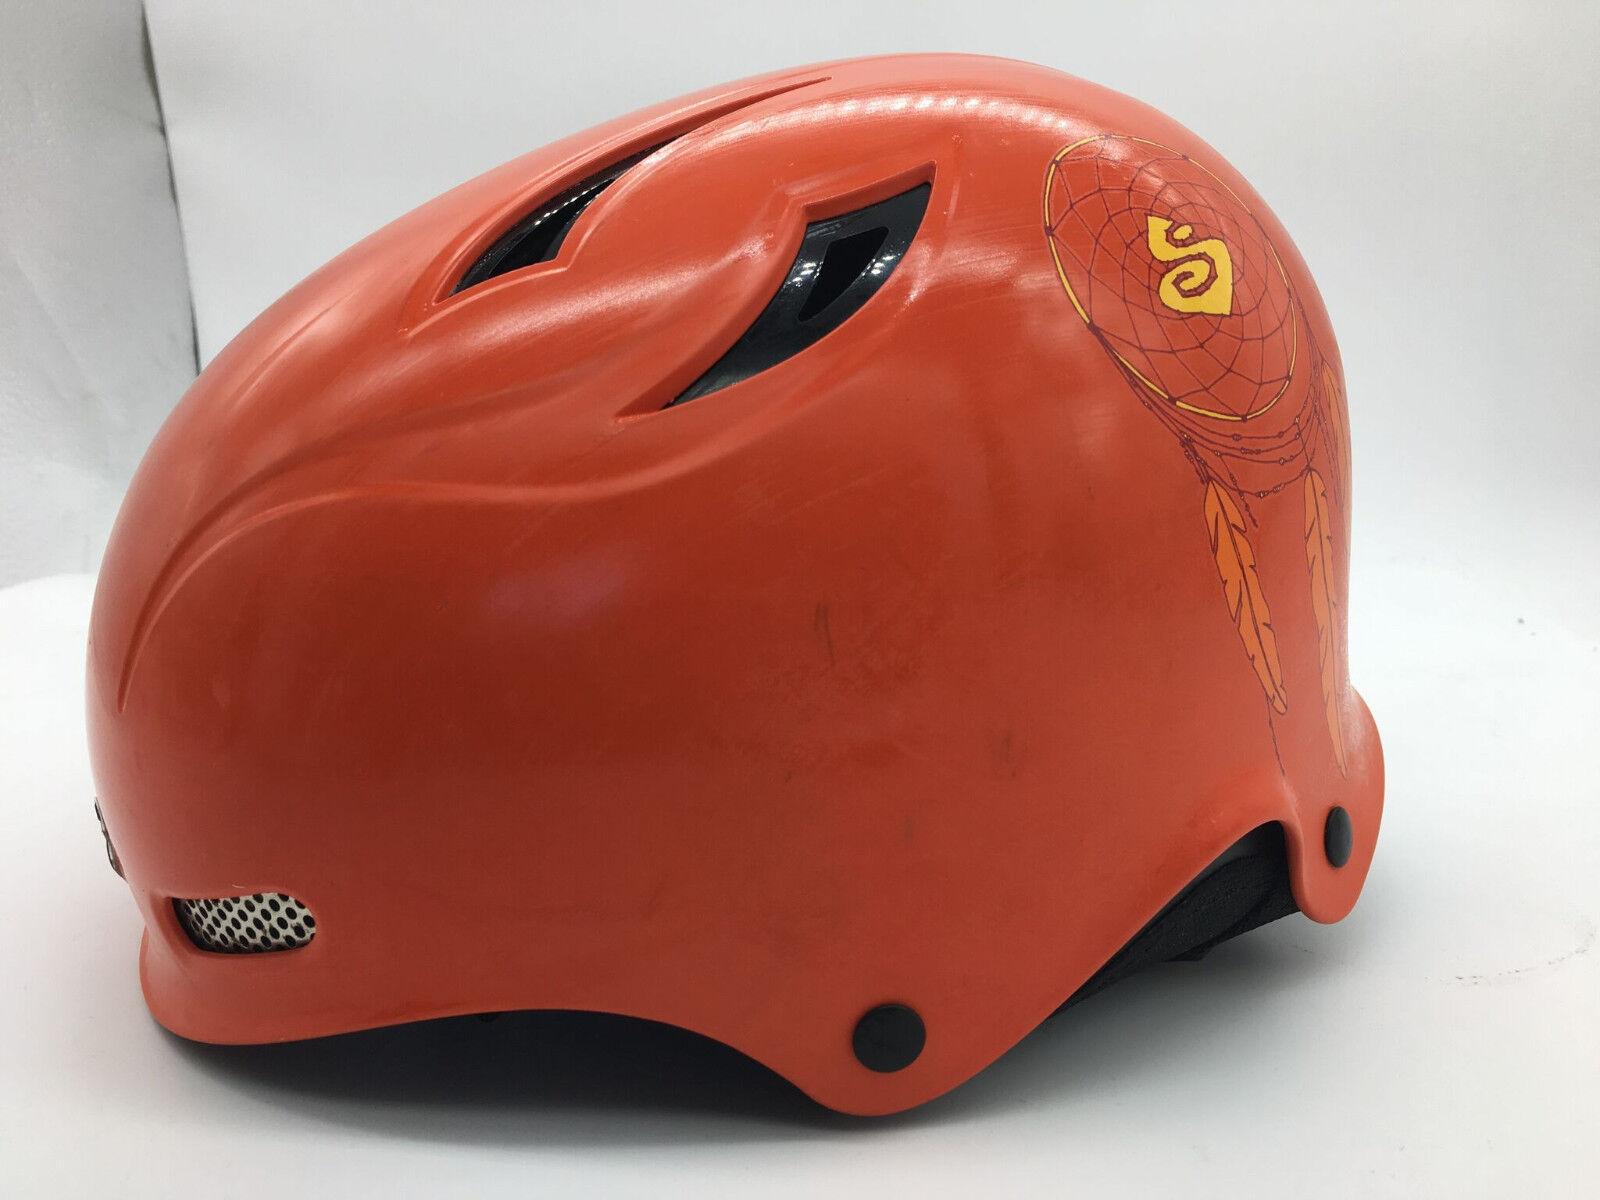 Sweet Protection Protection Protection Erwachsene Helmet Rooster S M PS9  | Online Shop  0e7357